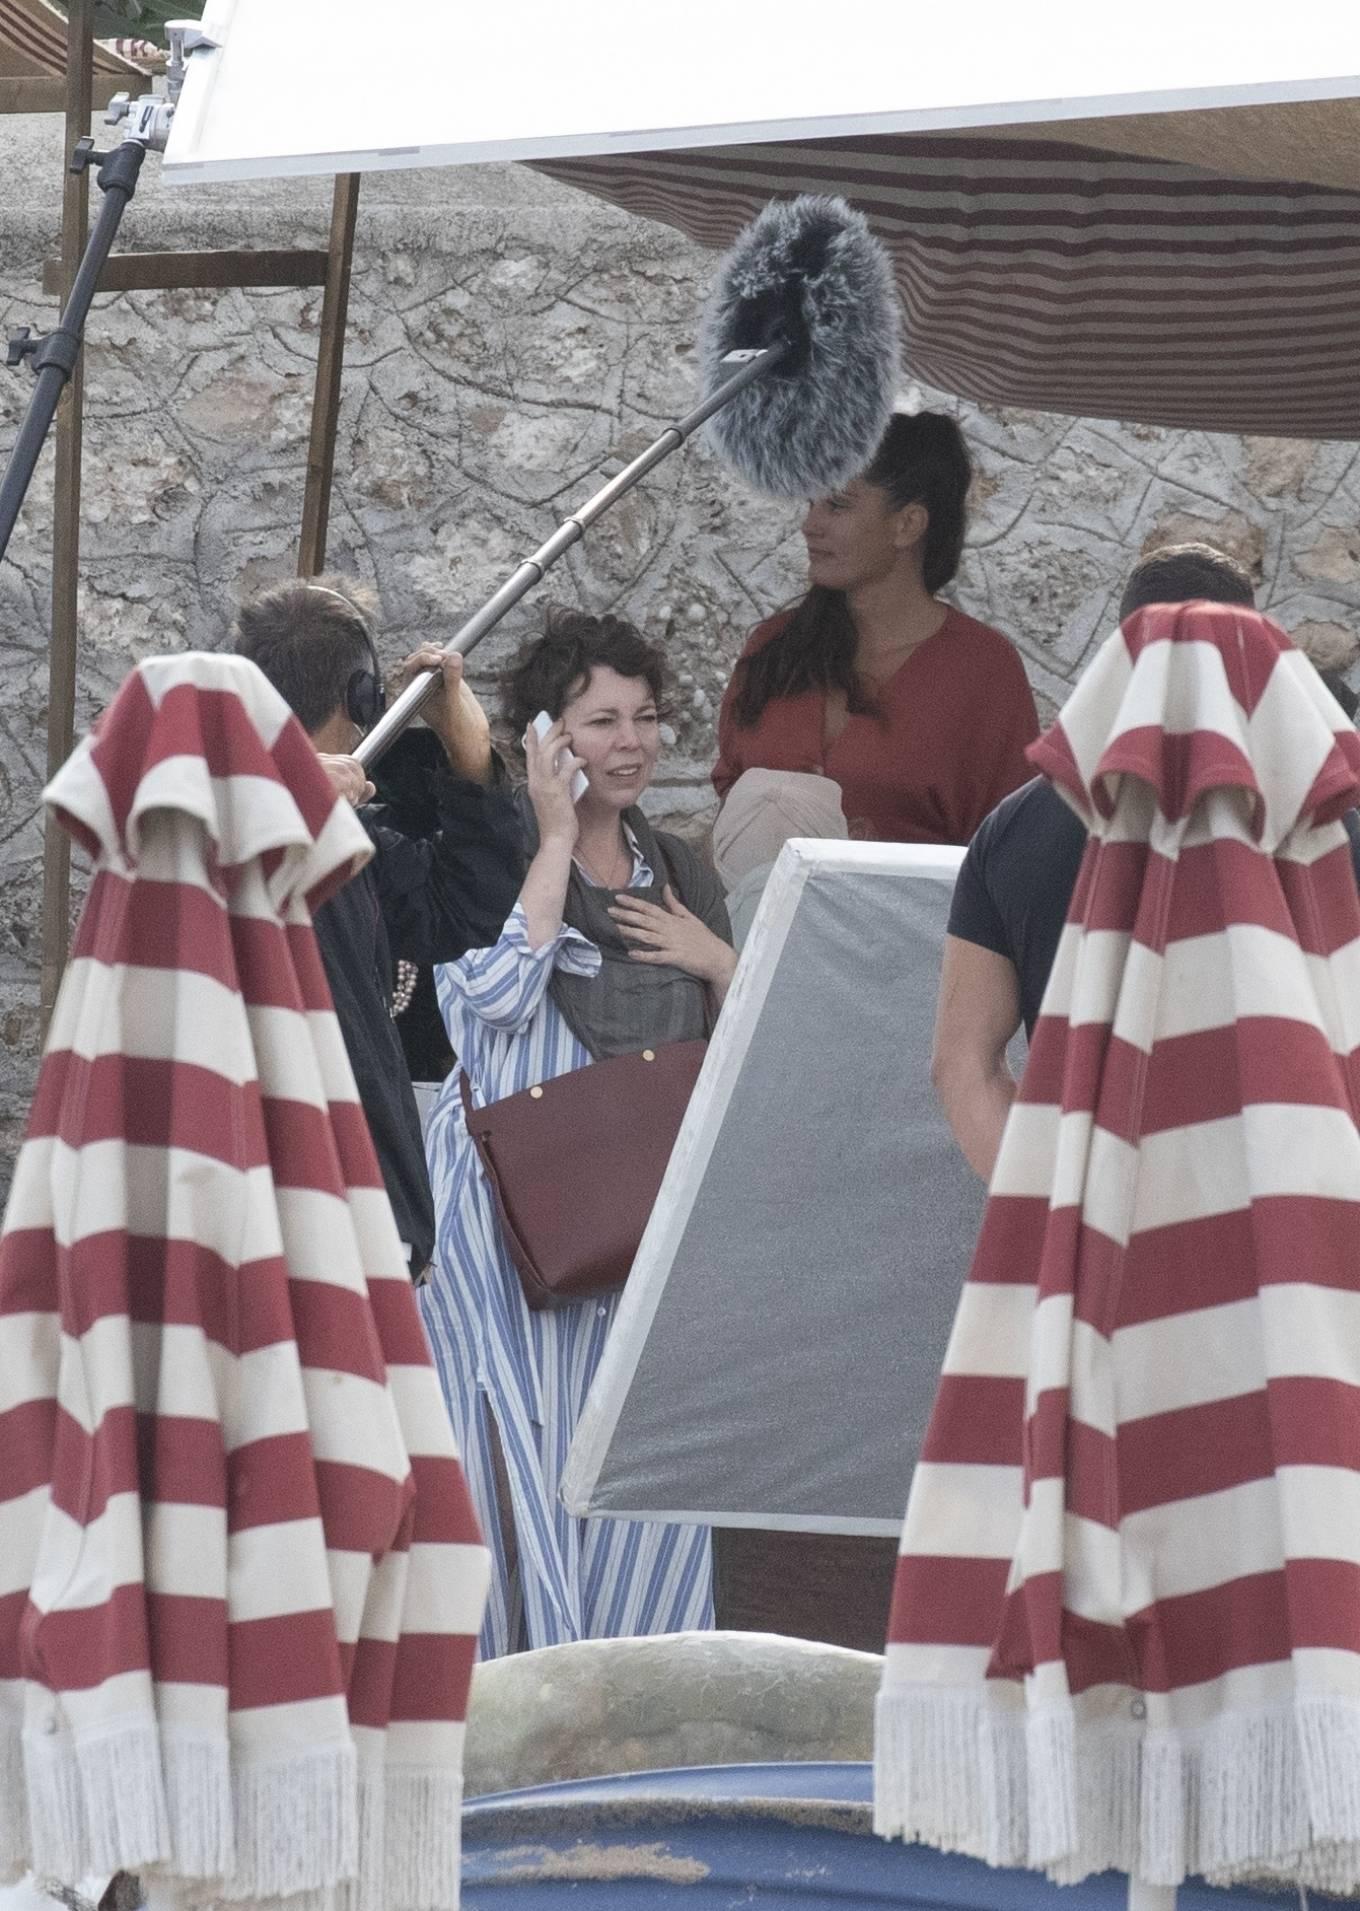 Dakota Johnson 2020 : Dakota Johnson – Filming The Lost Daughter in Speteses Island-17